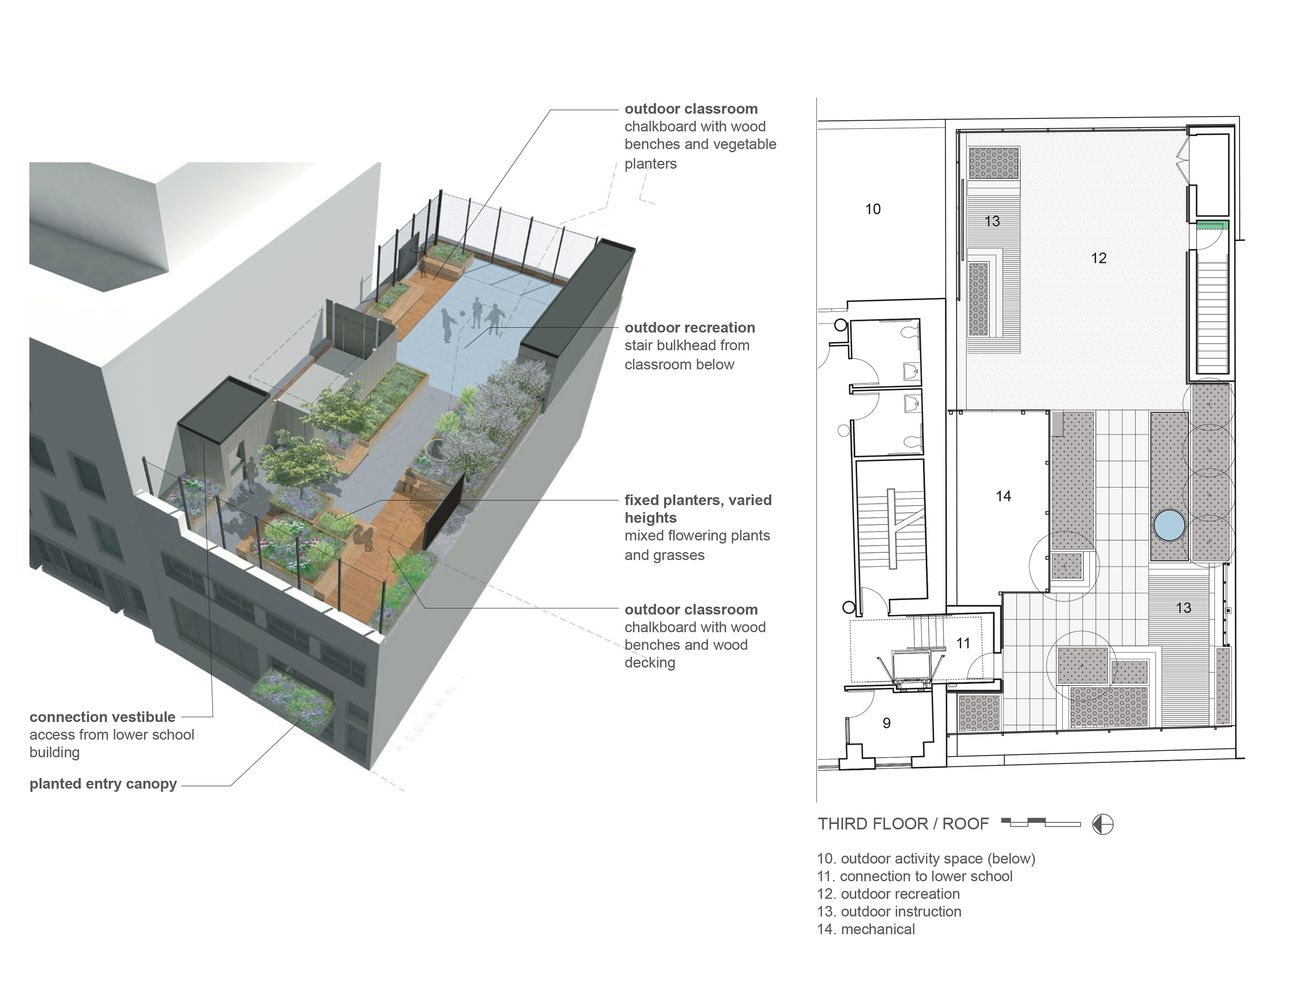 Gallery of blue school middle school pelloverton architects 19